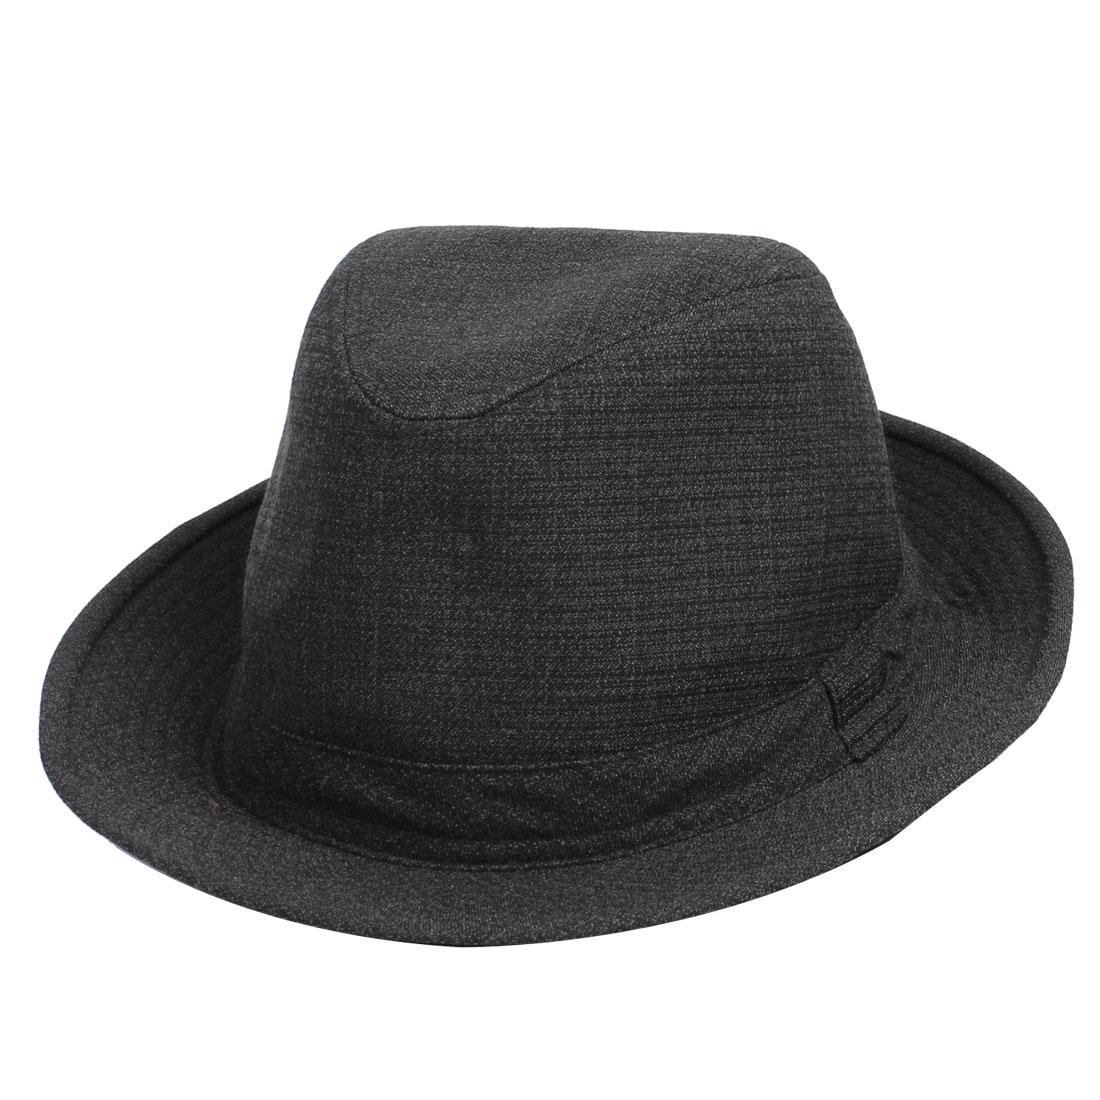 Men Woman Decoration Round Black Cotton Polyester Fedora Hat Cap